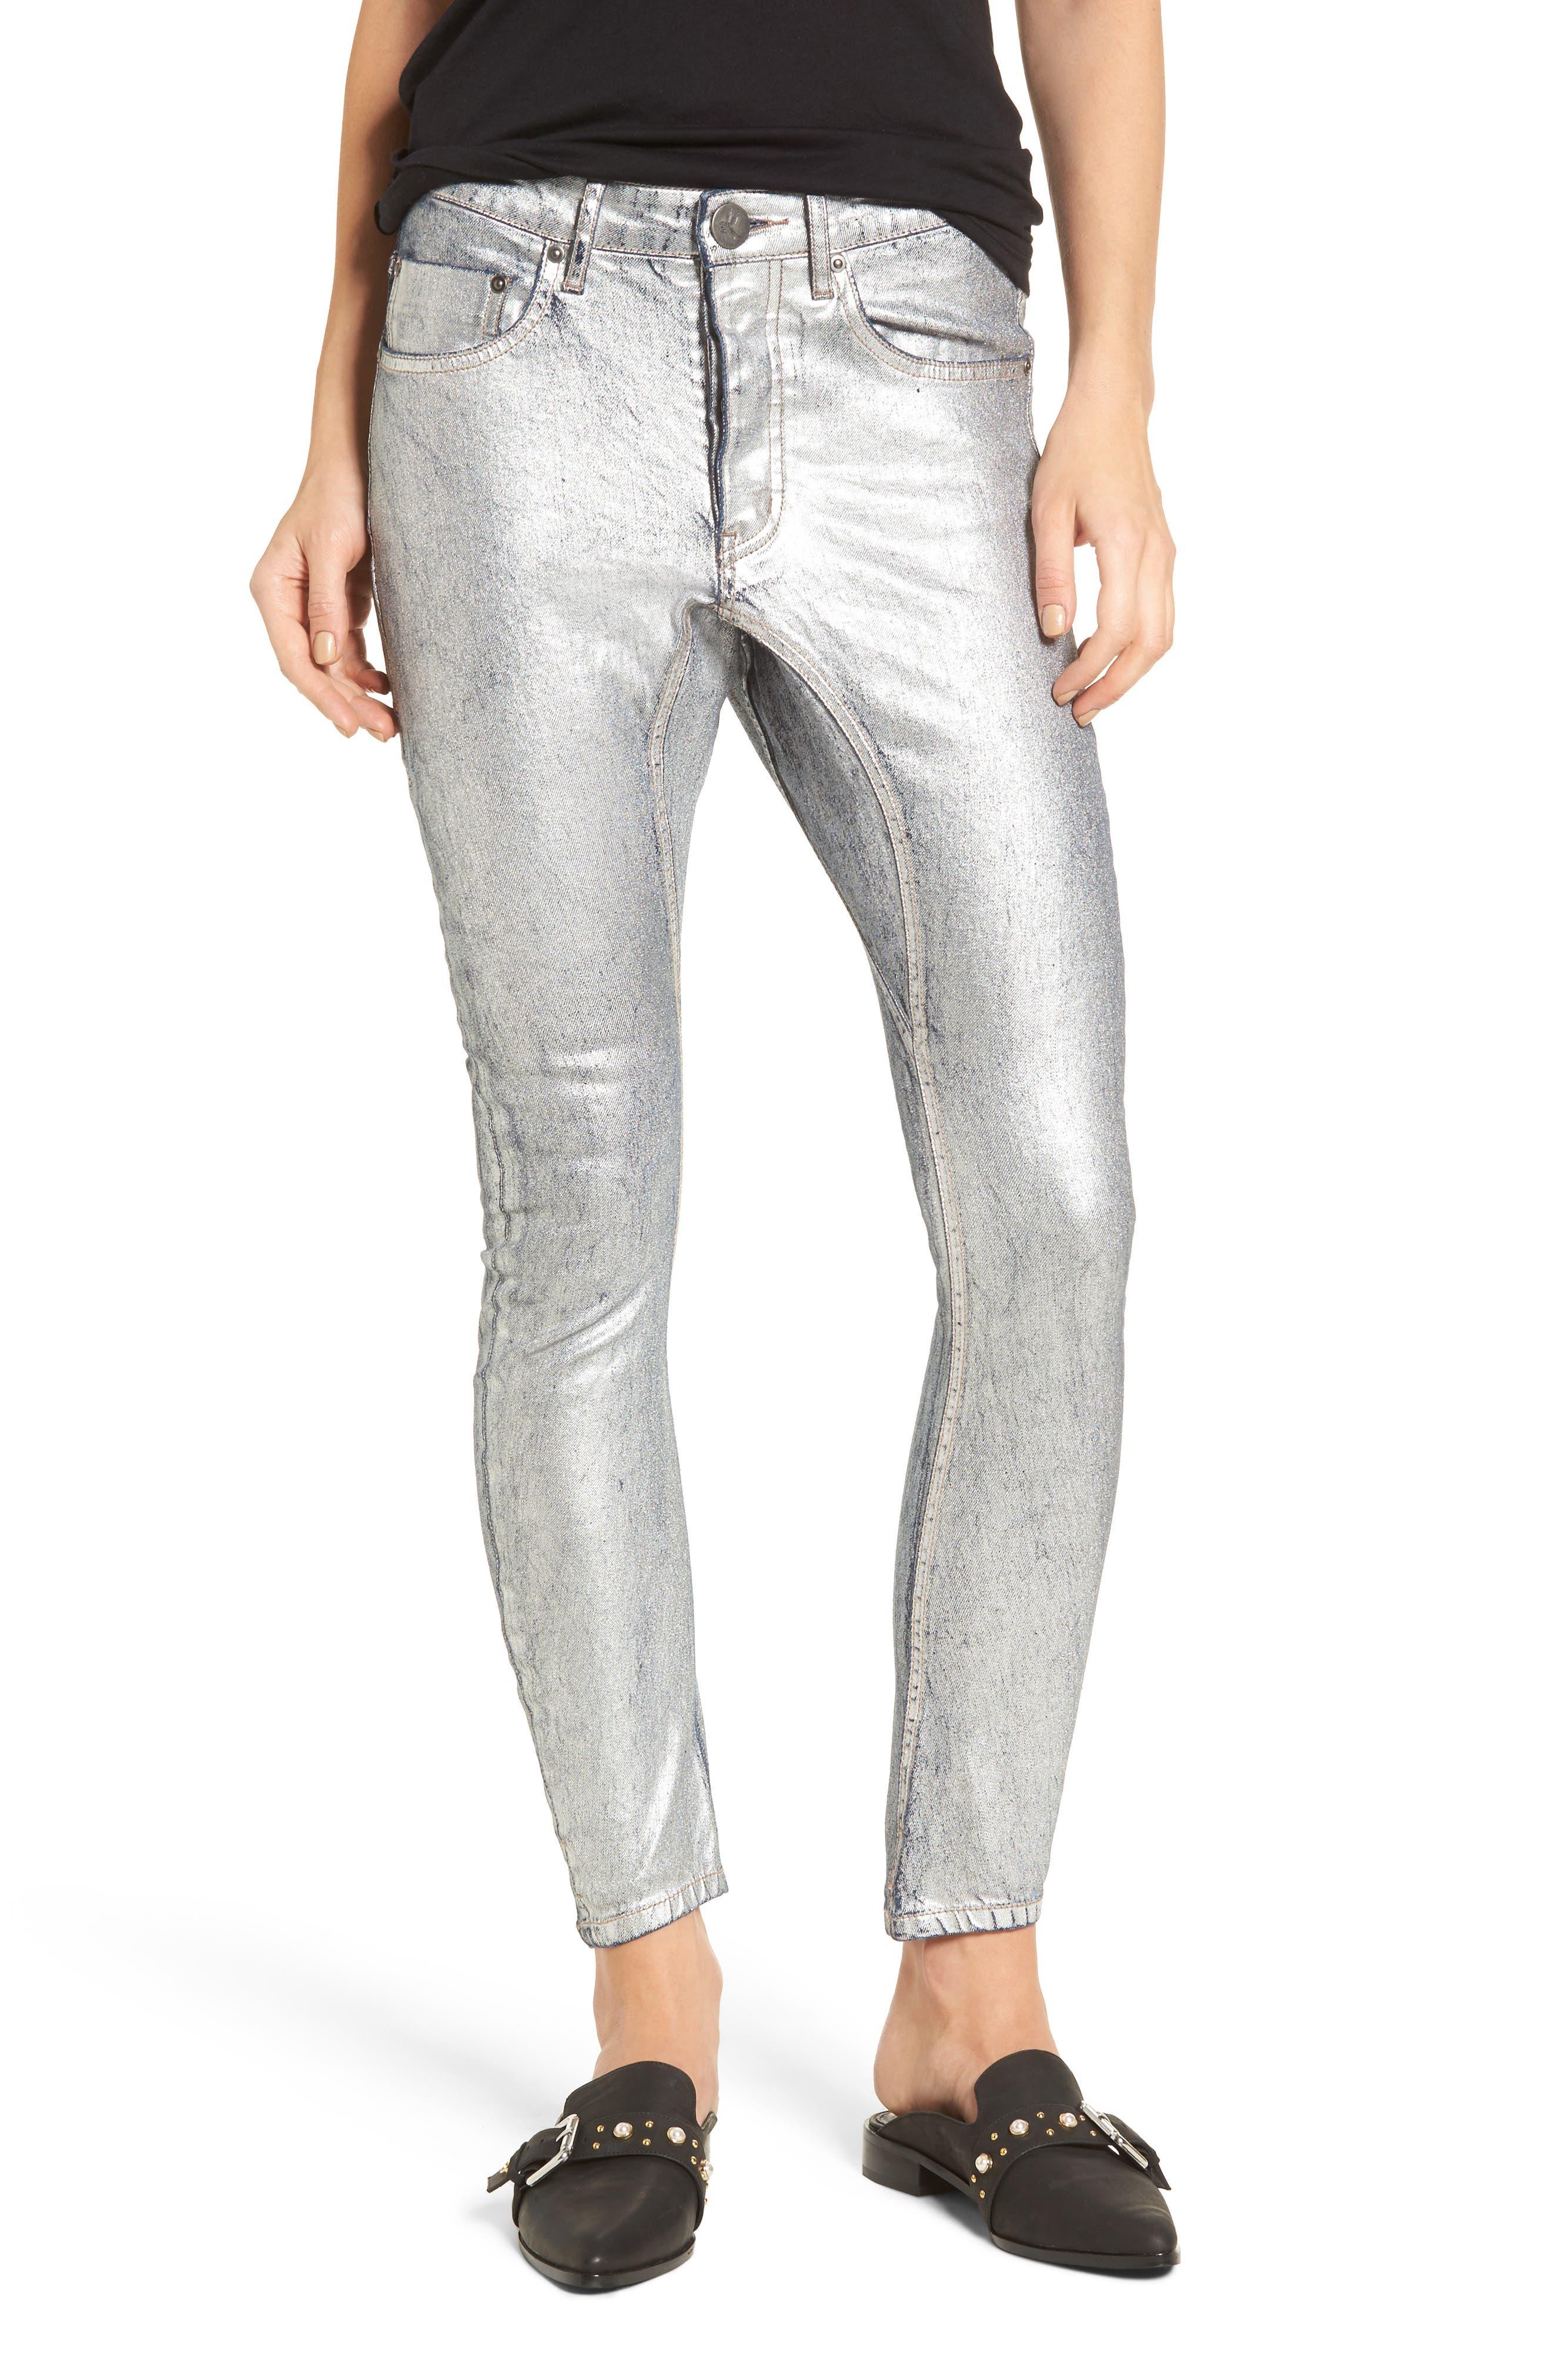 Kidds Metallic Drop Crotch Skinny Jeans,                         Main,                         color, 040